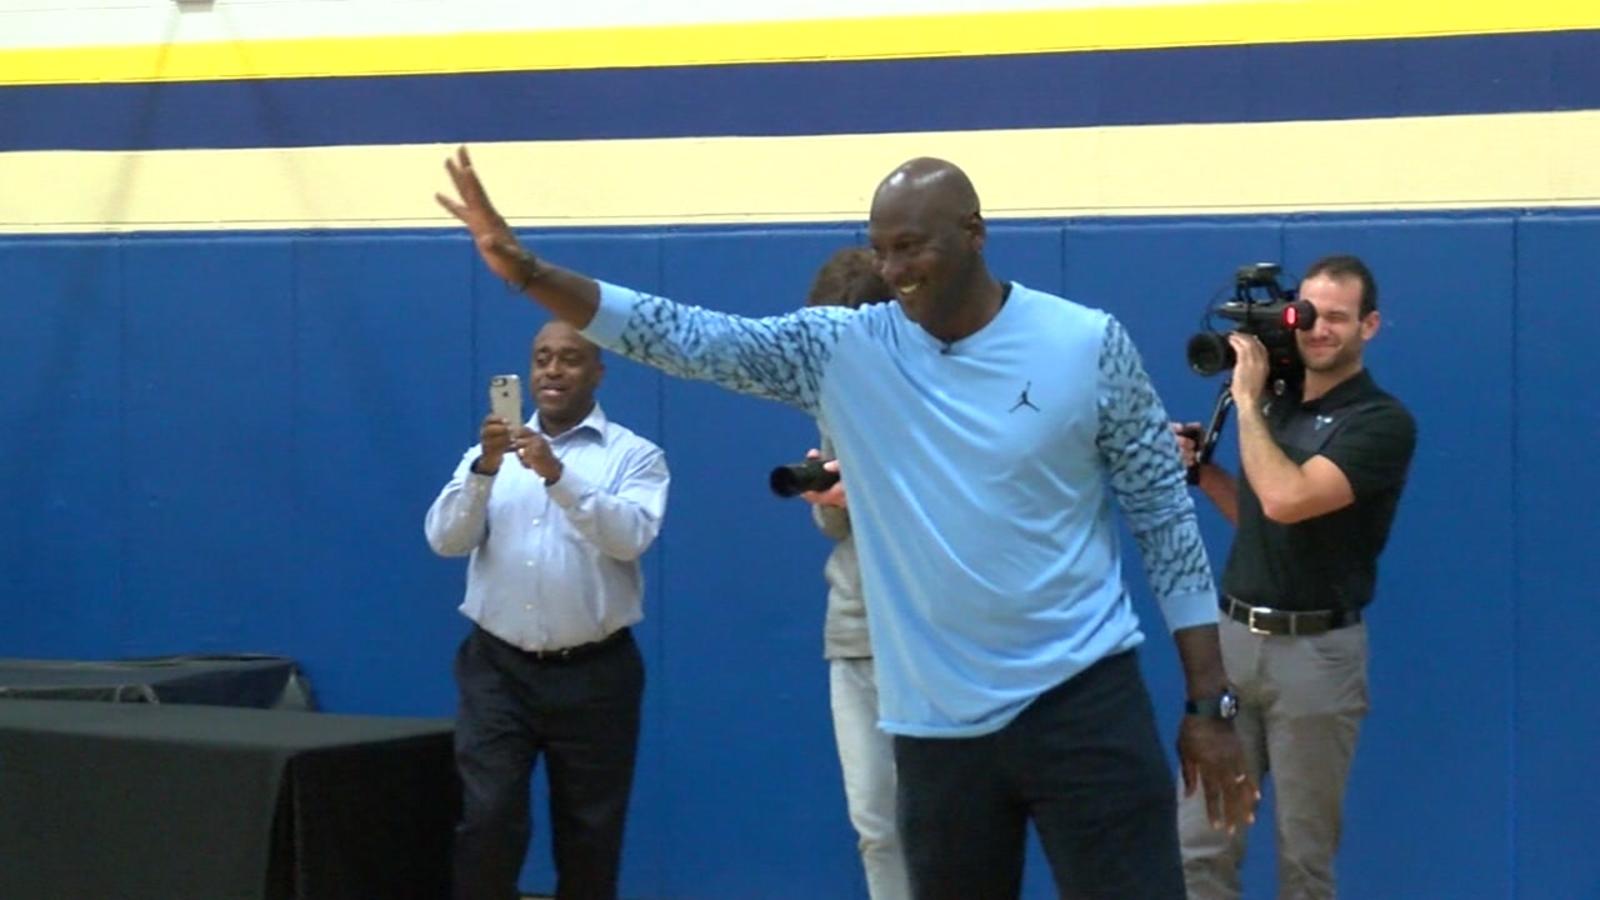 newest 5d651 d9001 Michael Jordan donates 50 pairs of Air Jordans to Wilmington Boys and Girls  Club   abc11.com